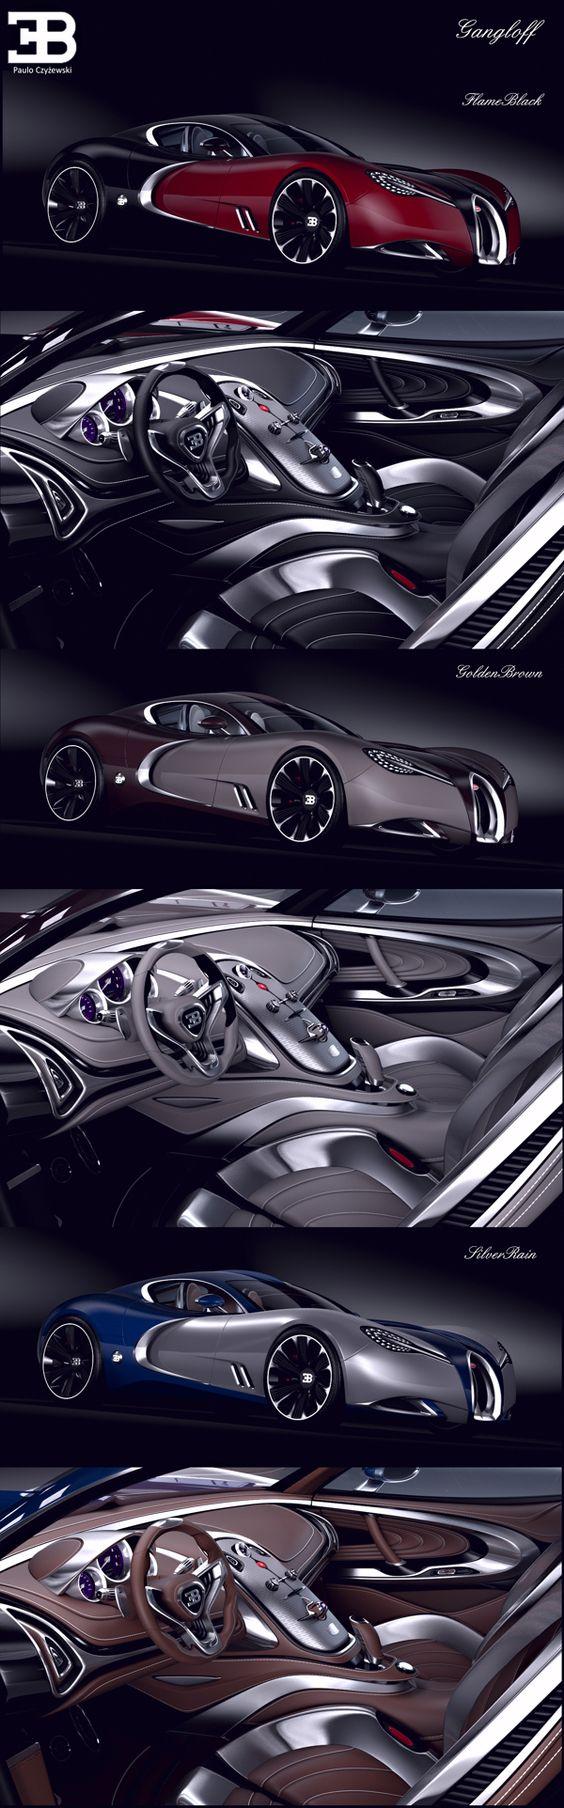 Bugatti Gangloff concept. Breath taking, stunning car.